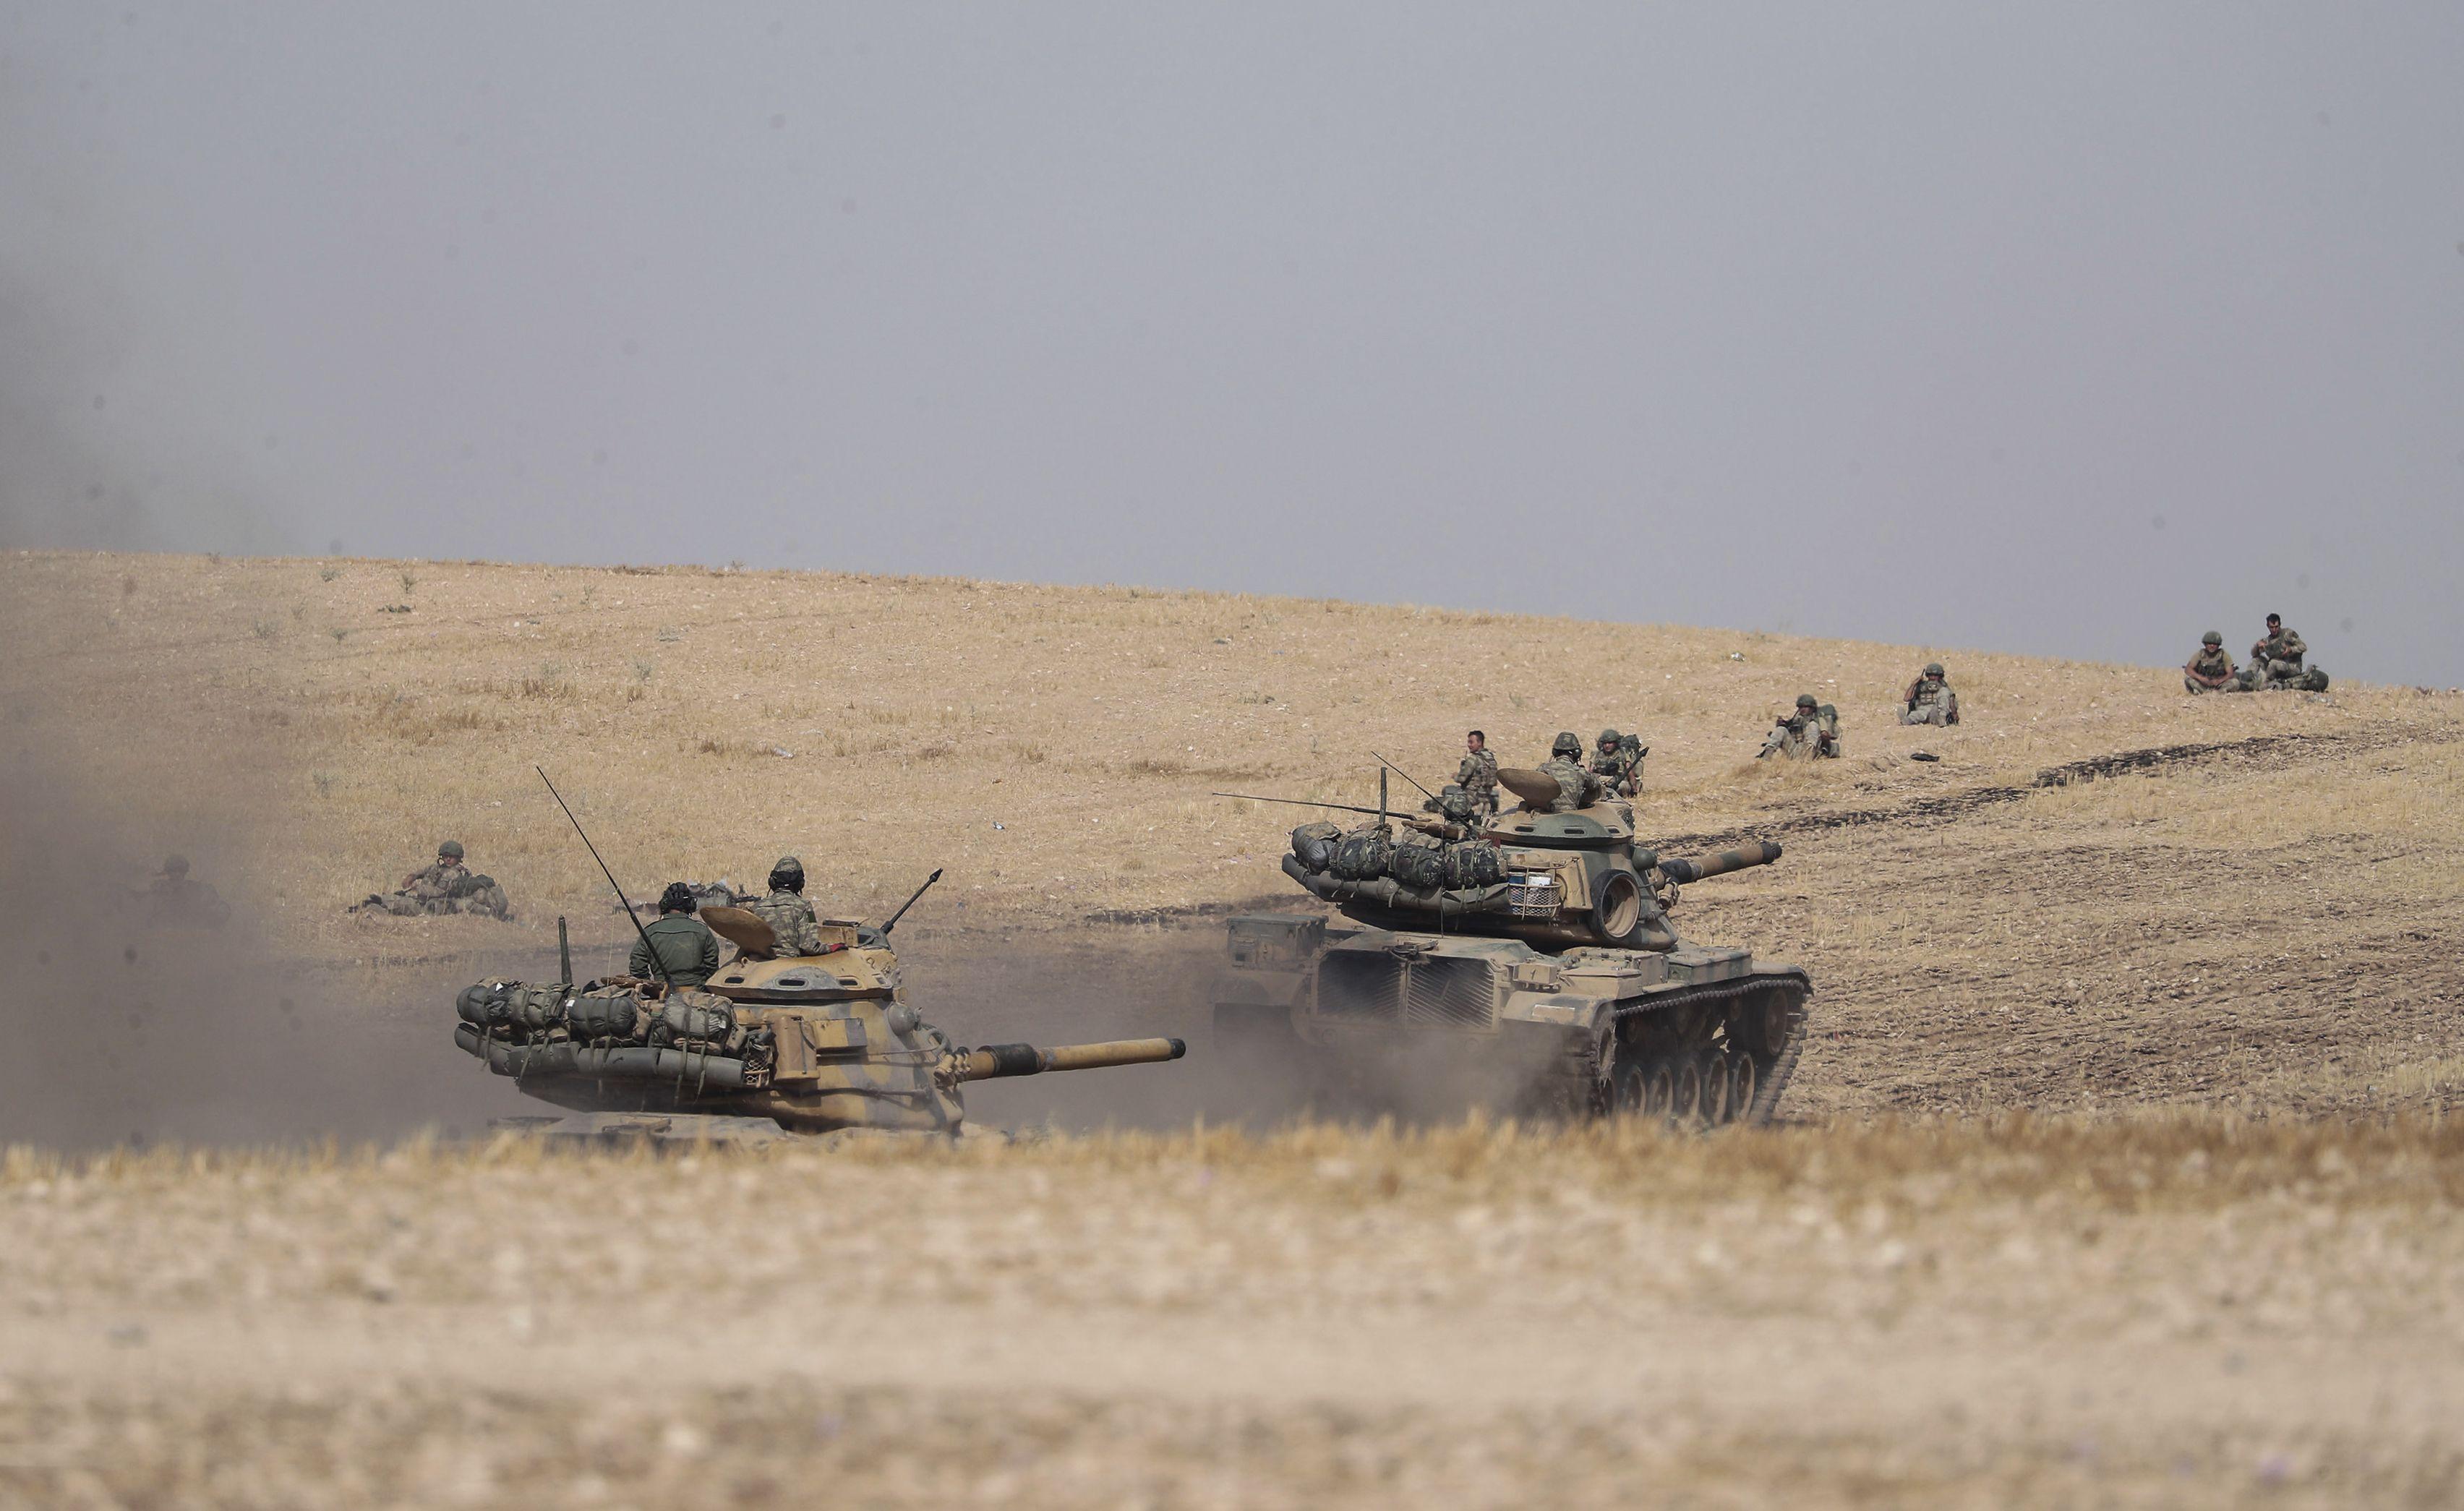 UN envoy calls on Turks, Kurds to cease fighting